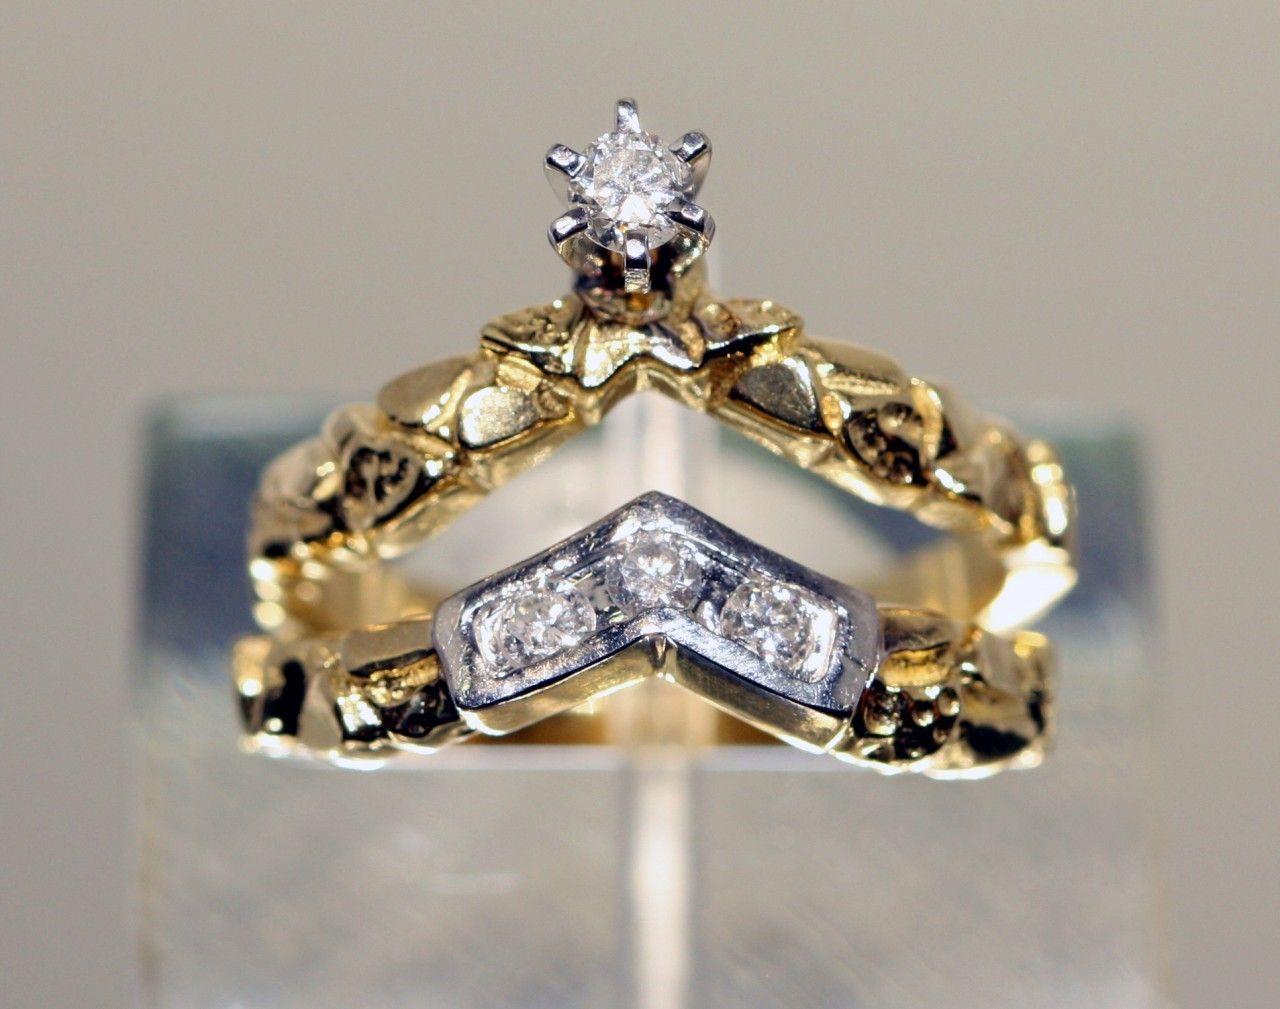 Citadel Diamond Group 14kt Yellow Nugget Gold Diamond Engagement Ring Gold Diamond Engagement Rings Diamond Engagement Band Engagement Ring